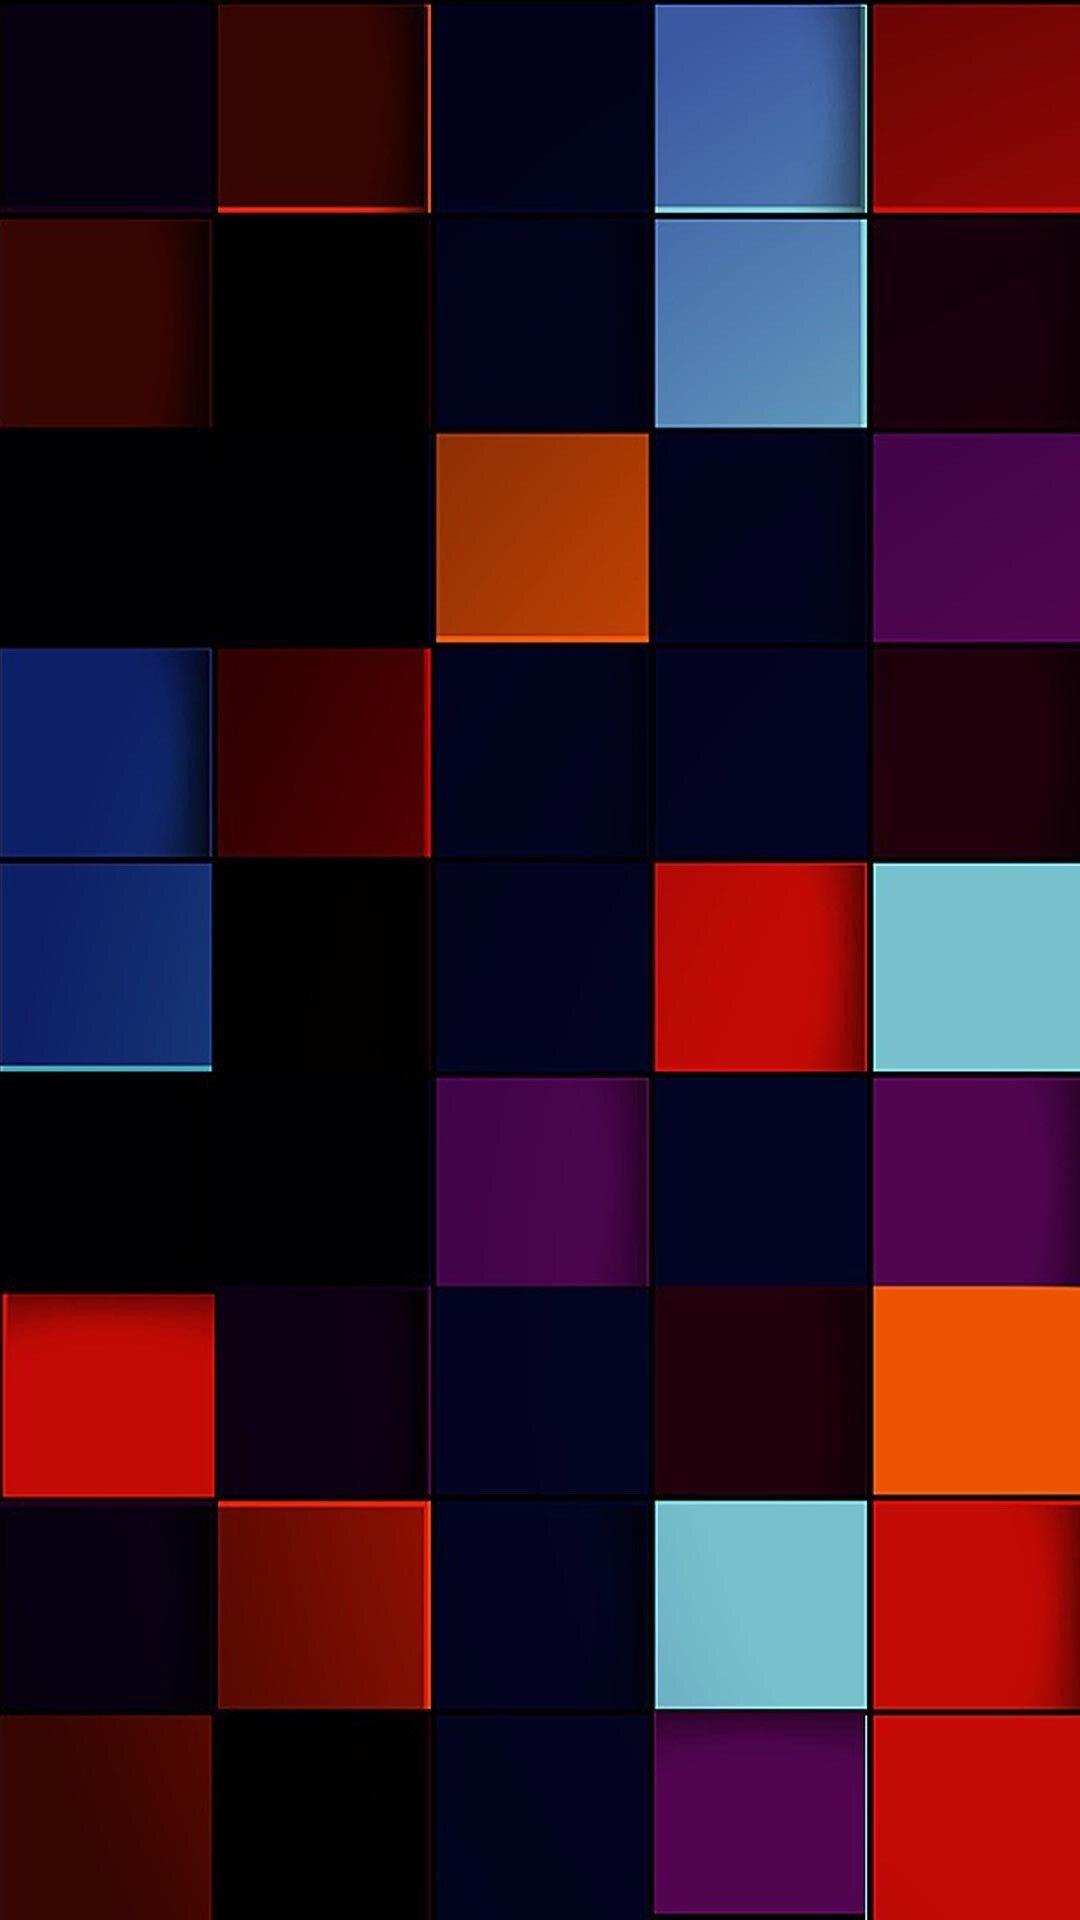 Colorful Geometric Shapes Wallpaper